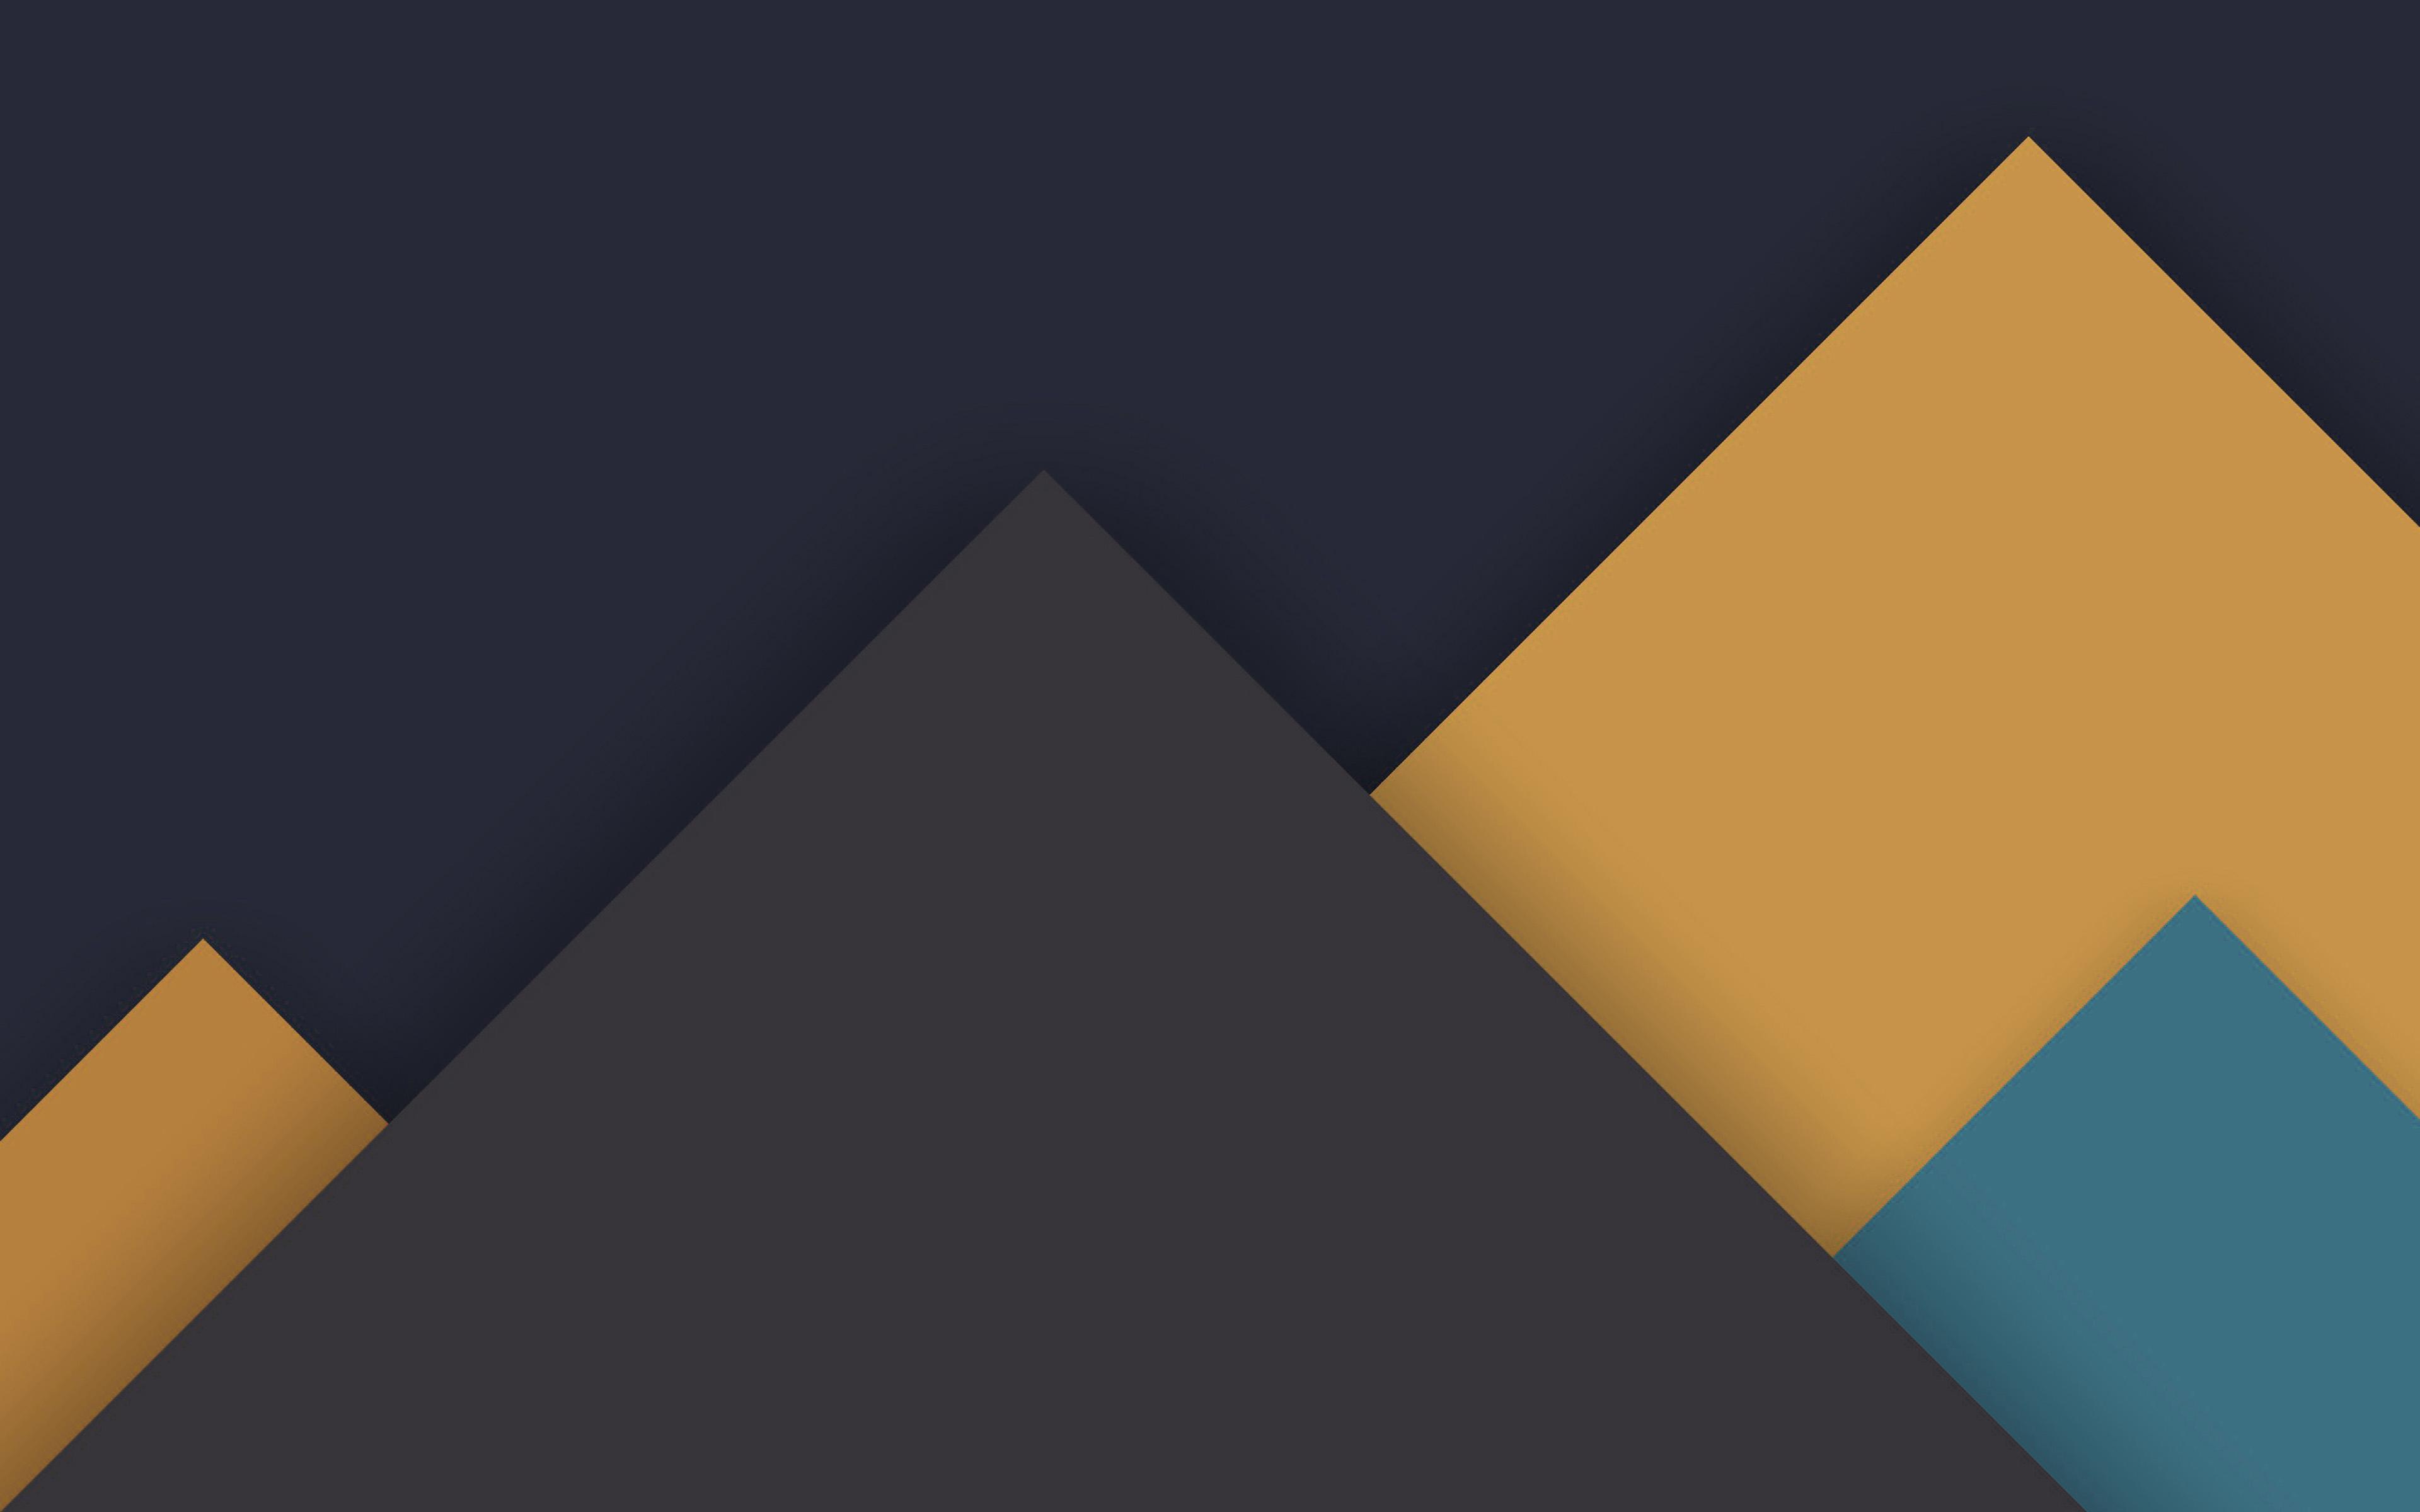 wallpaper for desktop, laptop